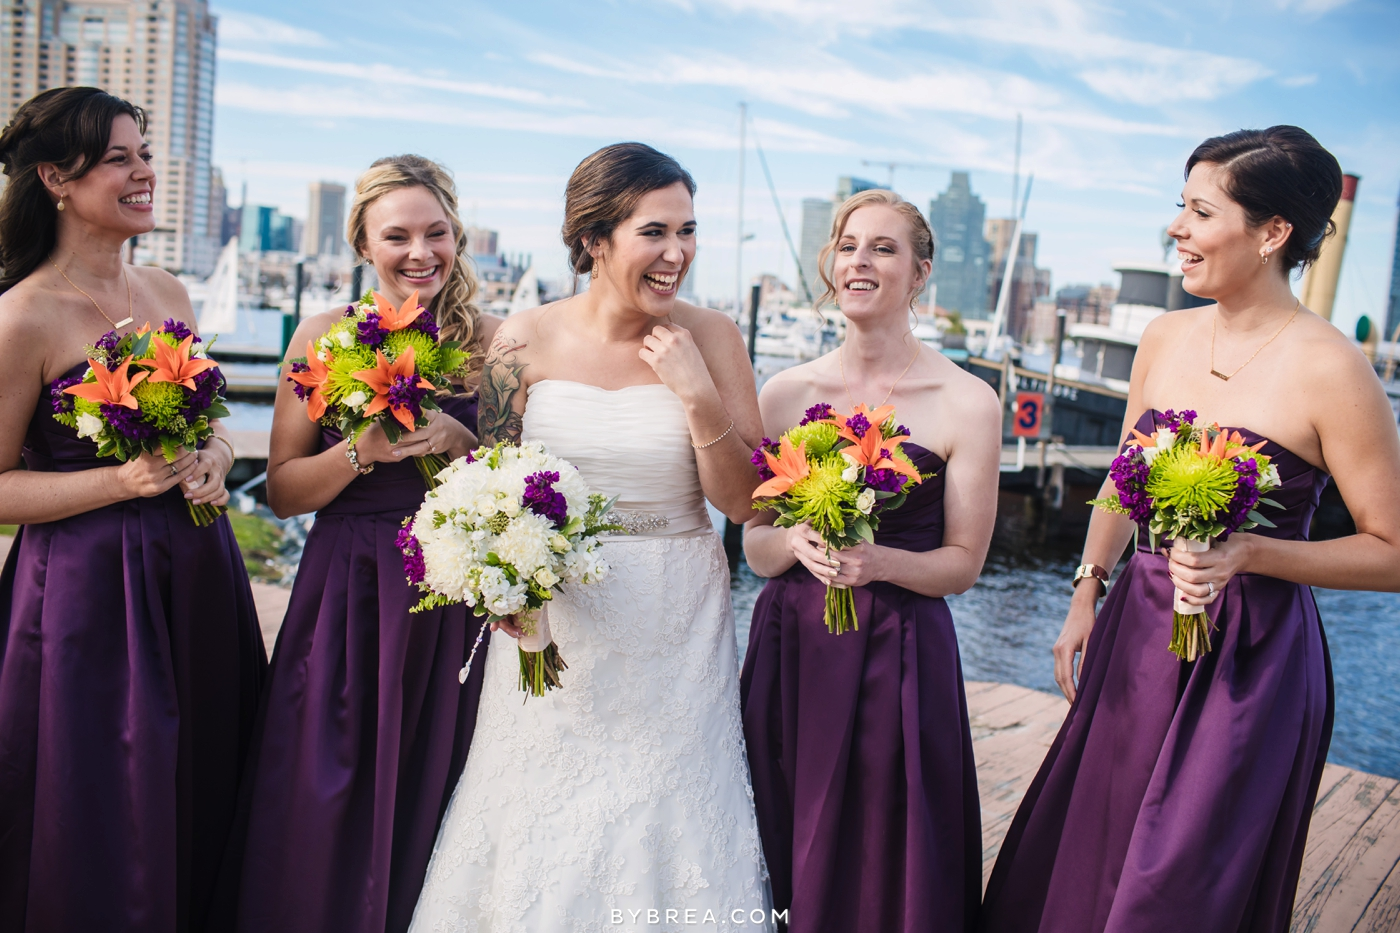 Baltimore wedding photo bride and bridesmaids